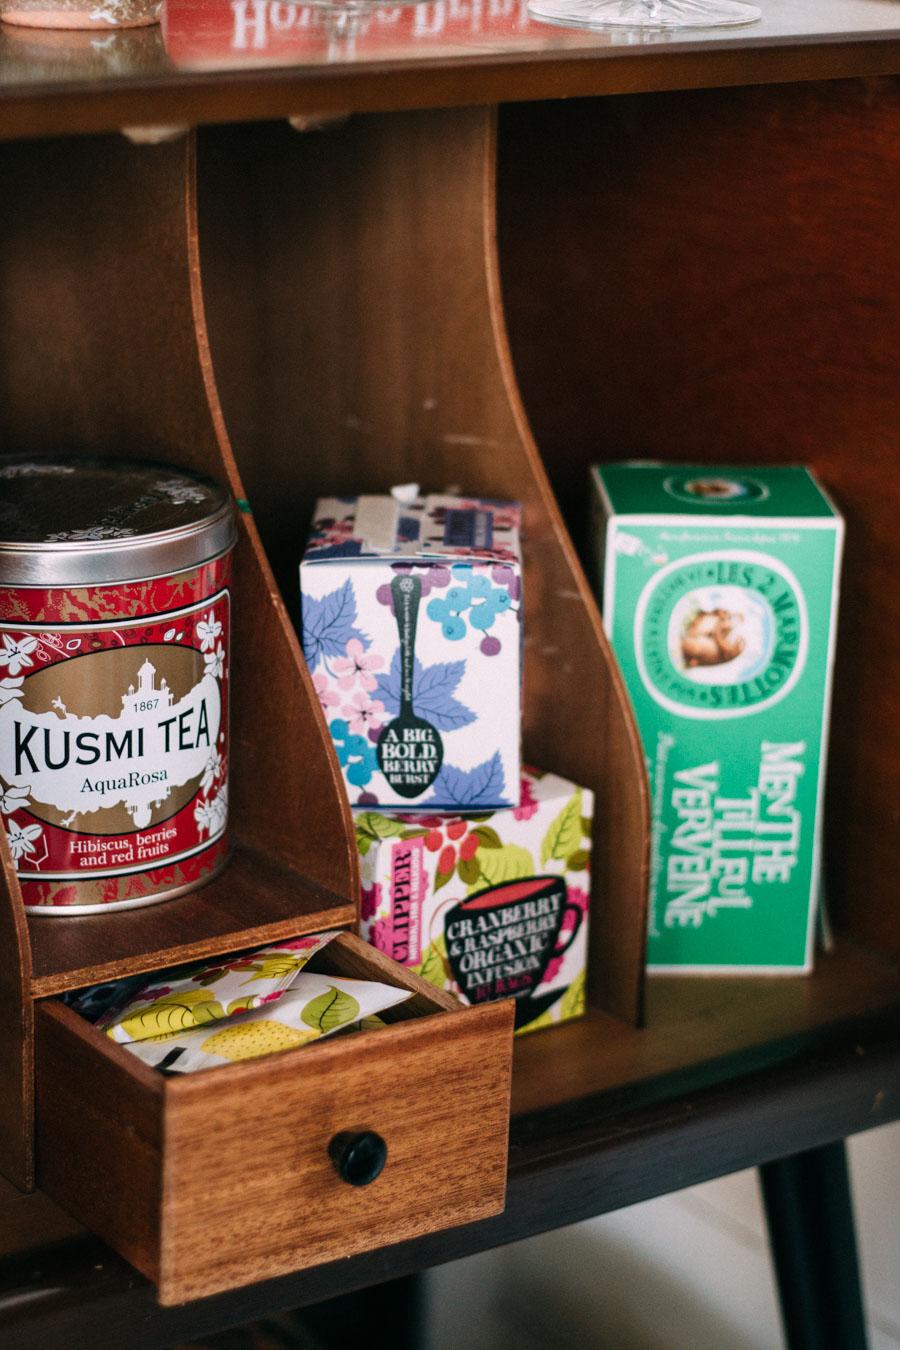 Favourite herbal teas